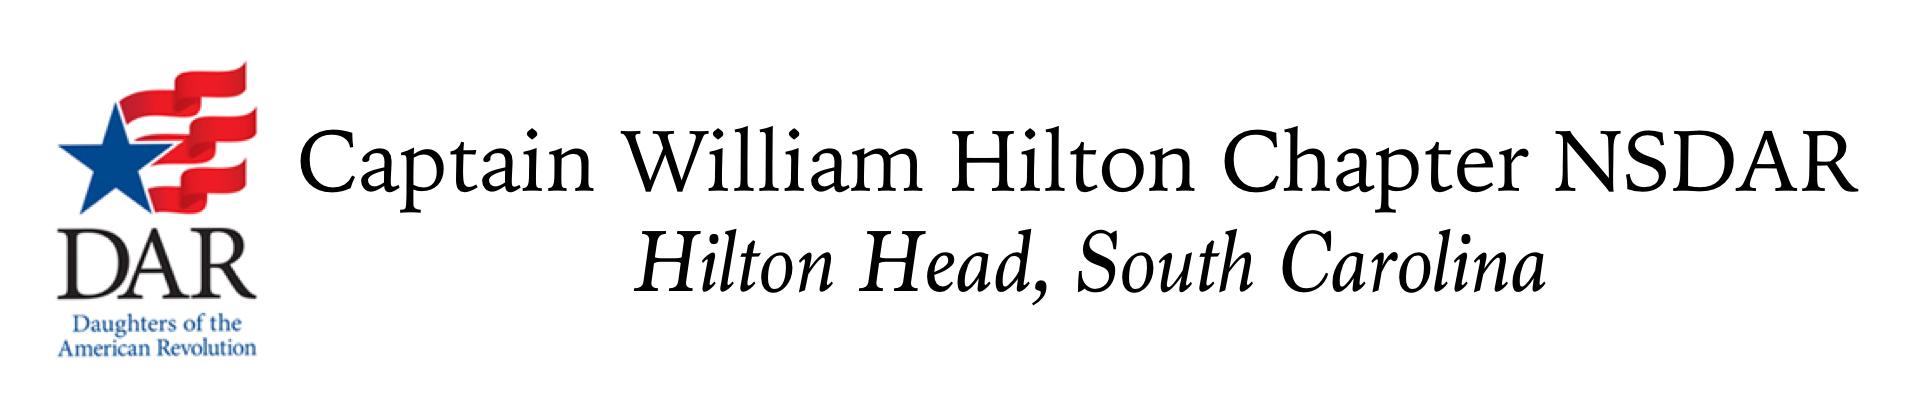 Captain William Hilton Chapter .png